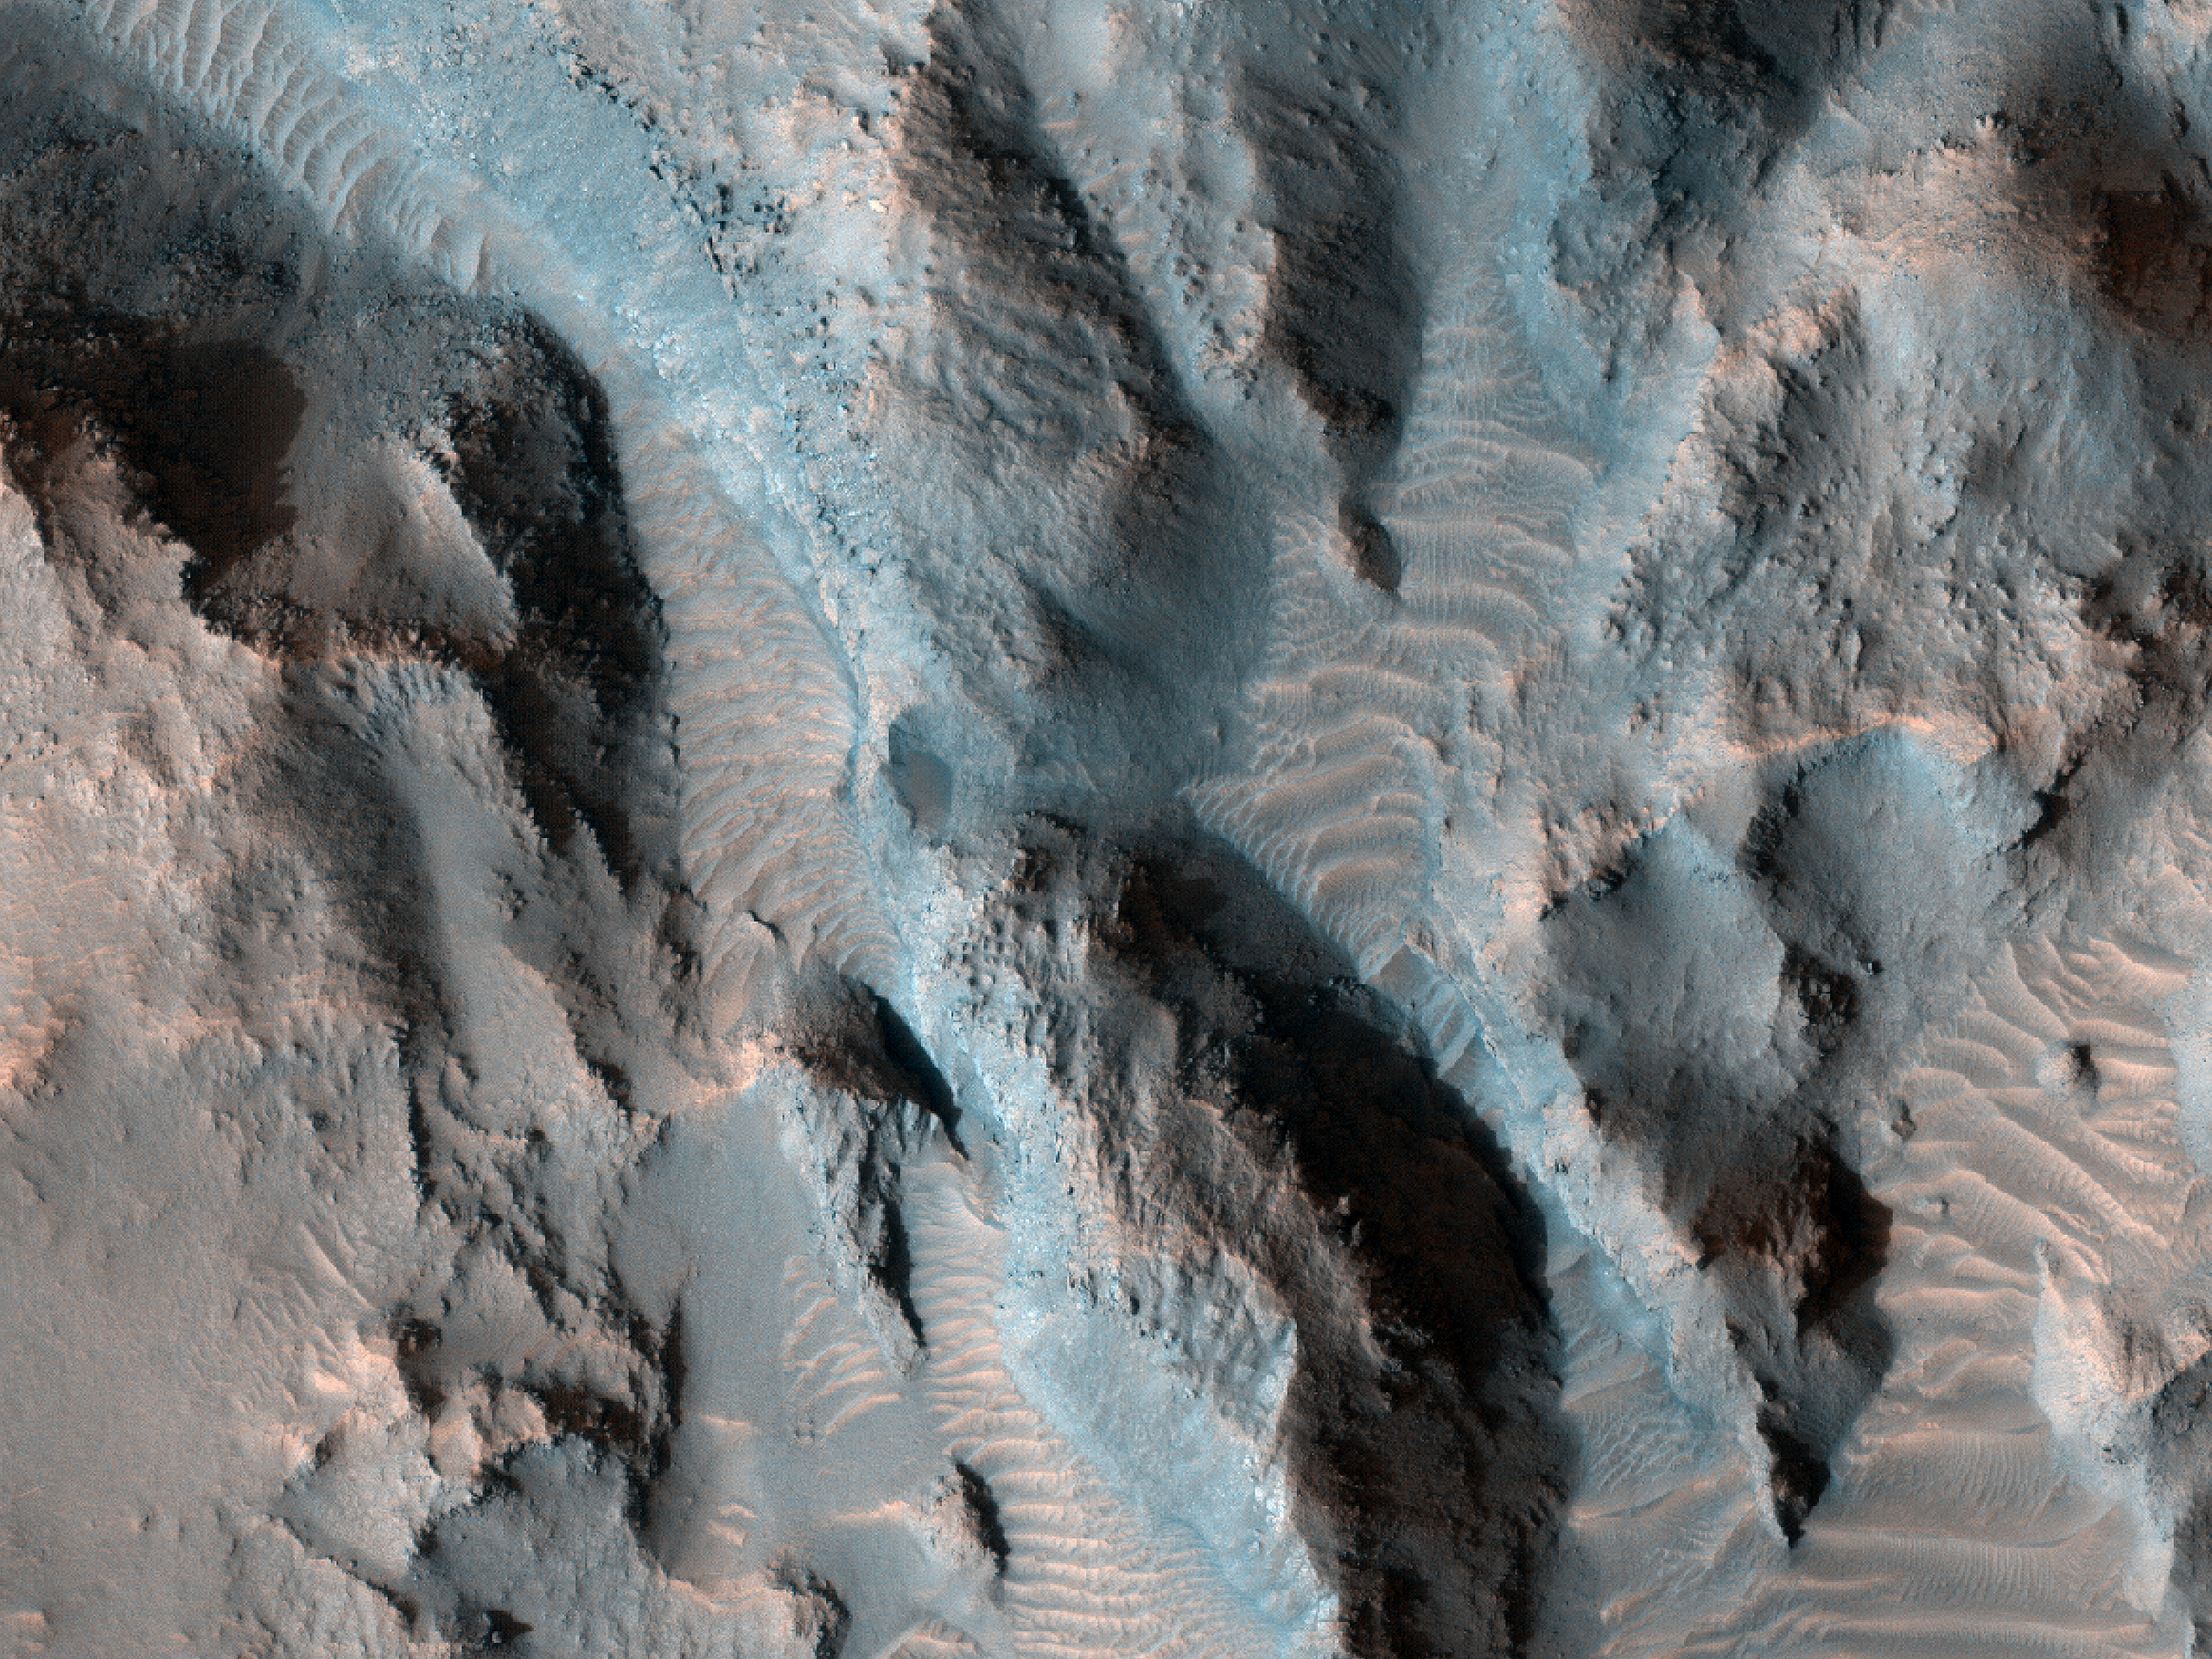 Layered Bedrock